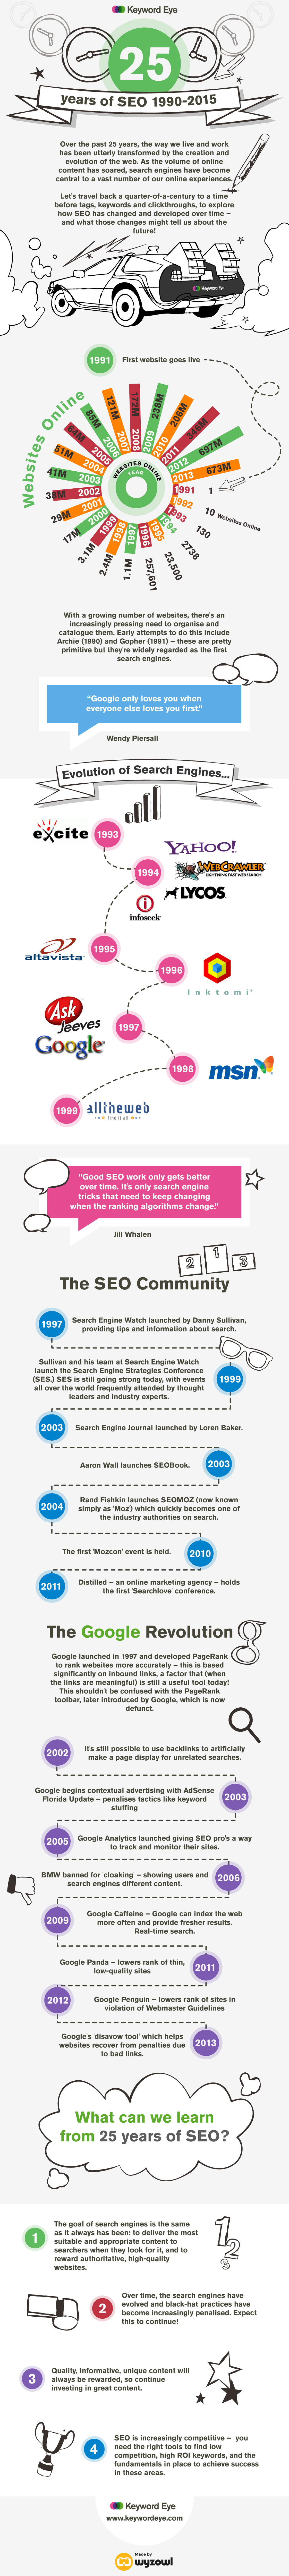 25 Years of SEO 1990-2015